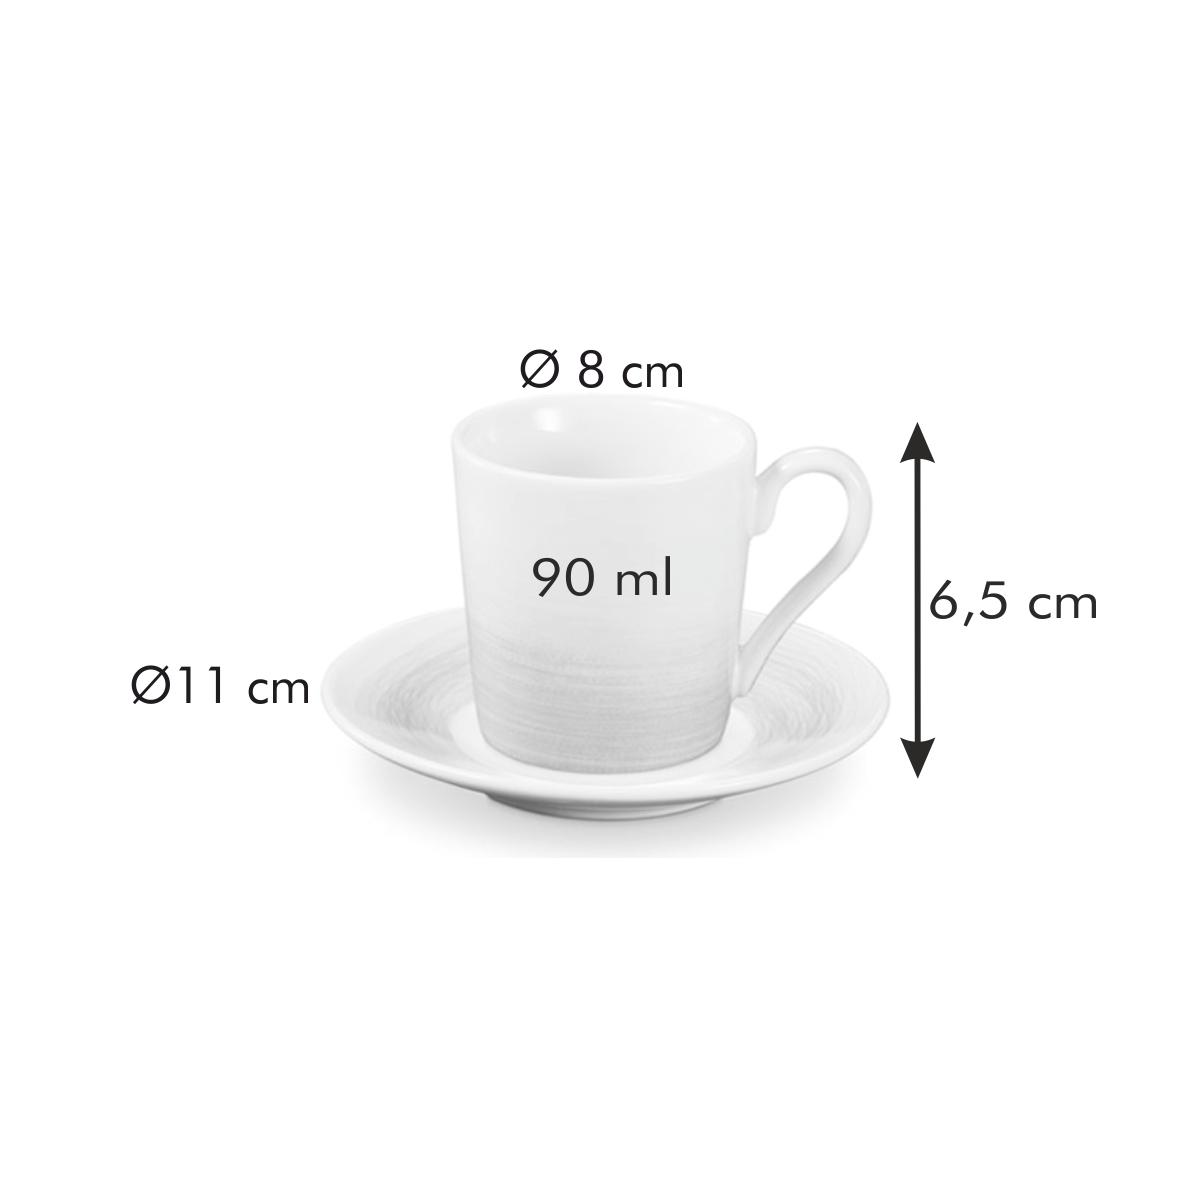 Šálek na espresso s podšálkem myCOFFEE, 6 ks, Pastels